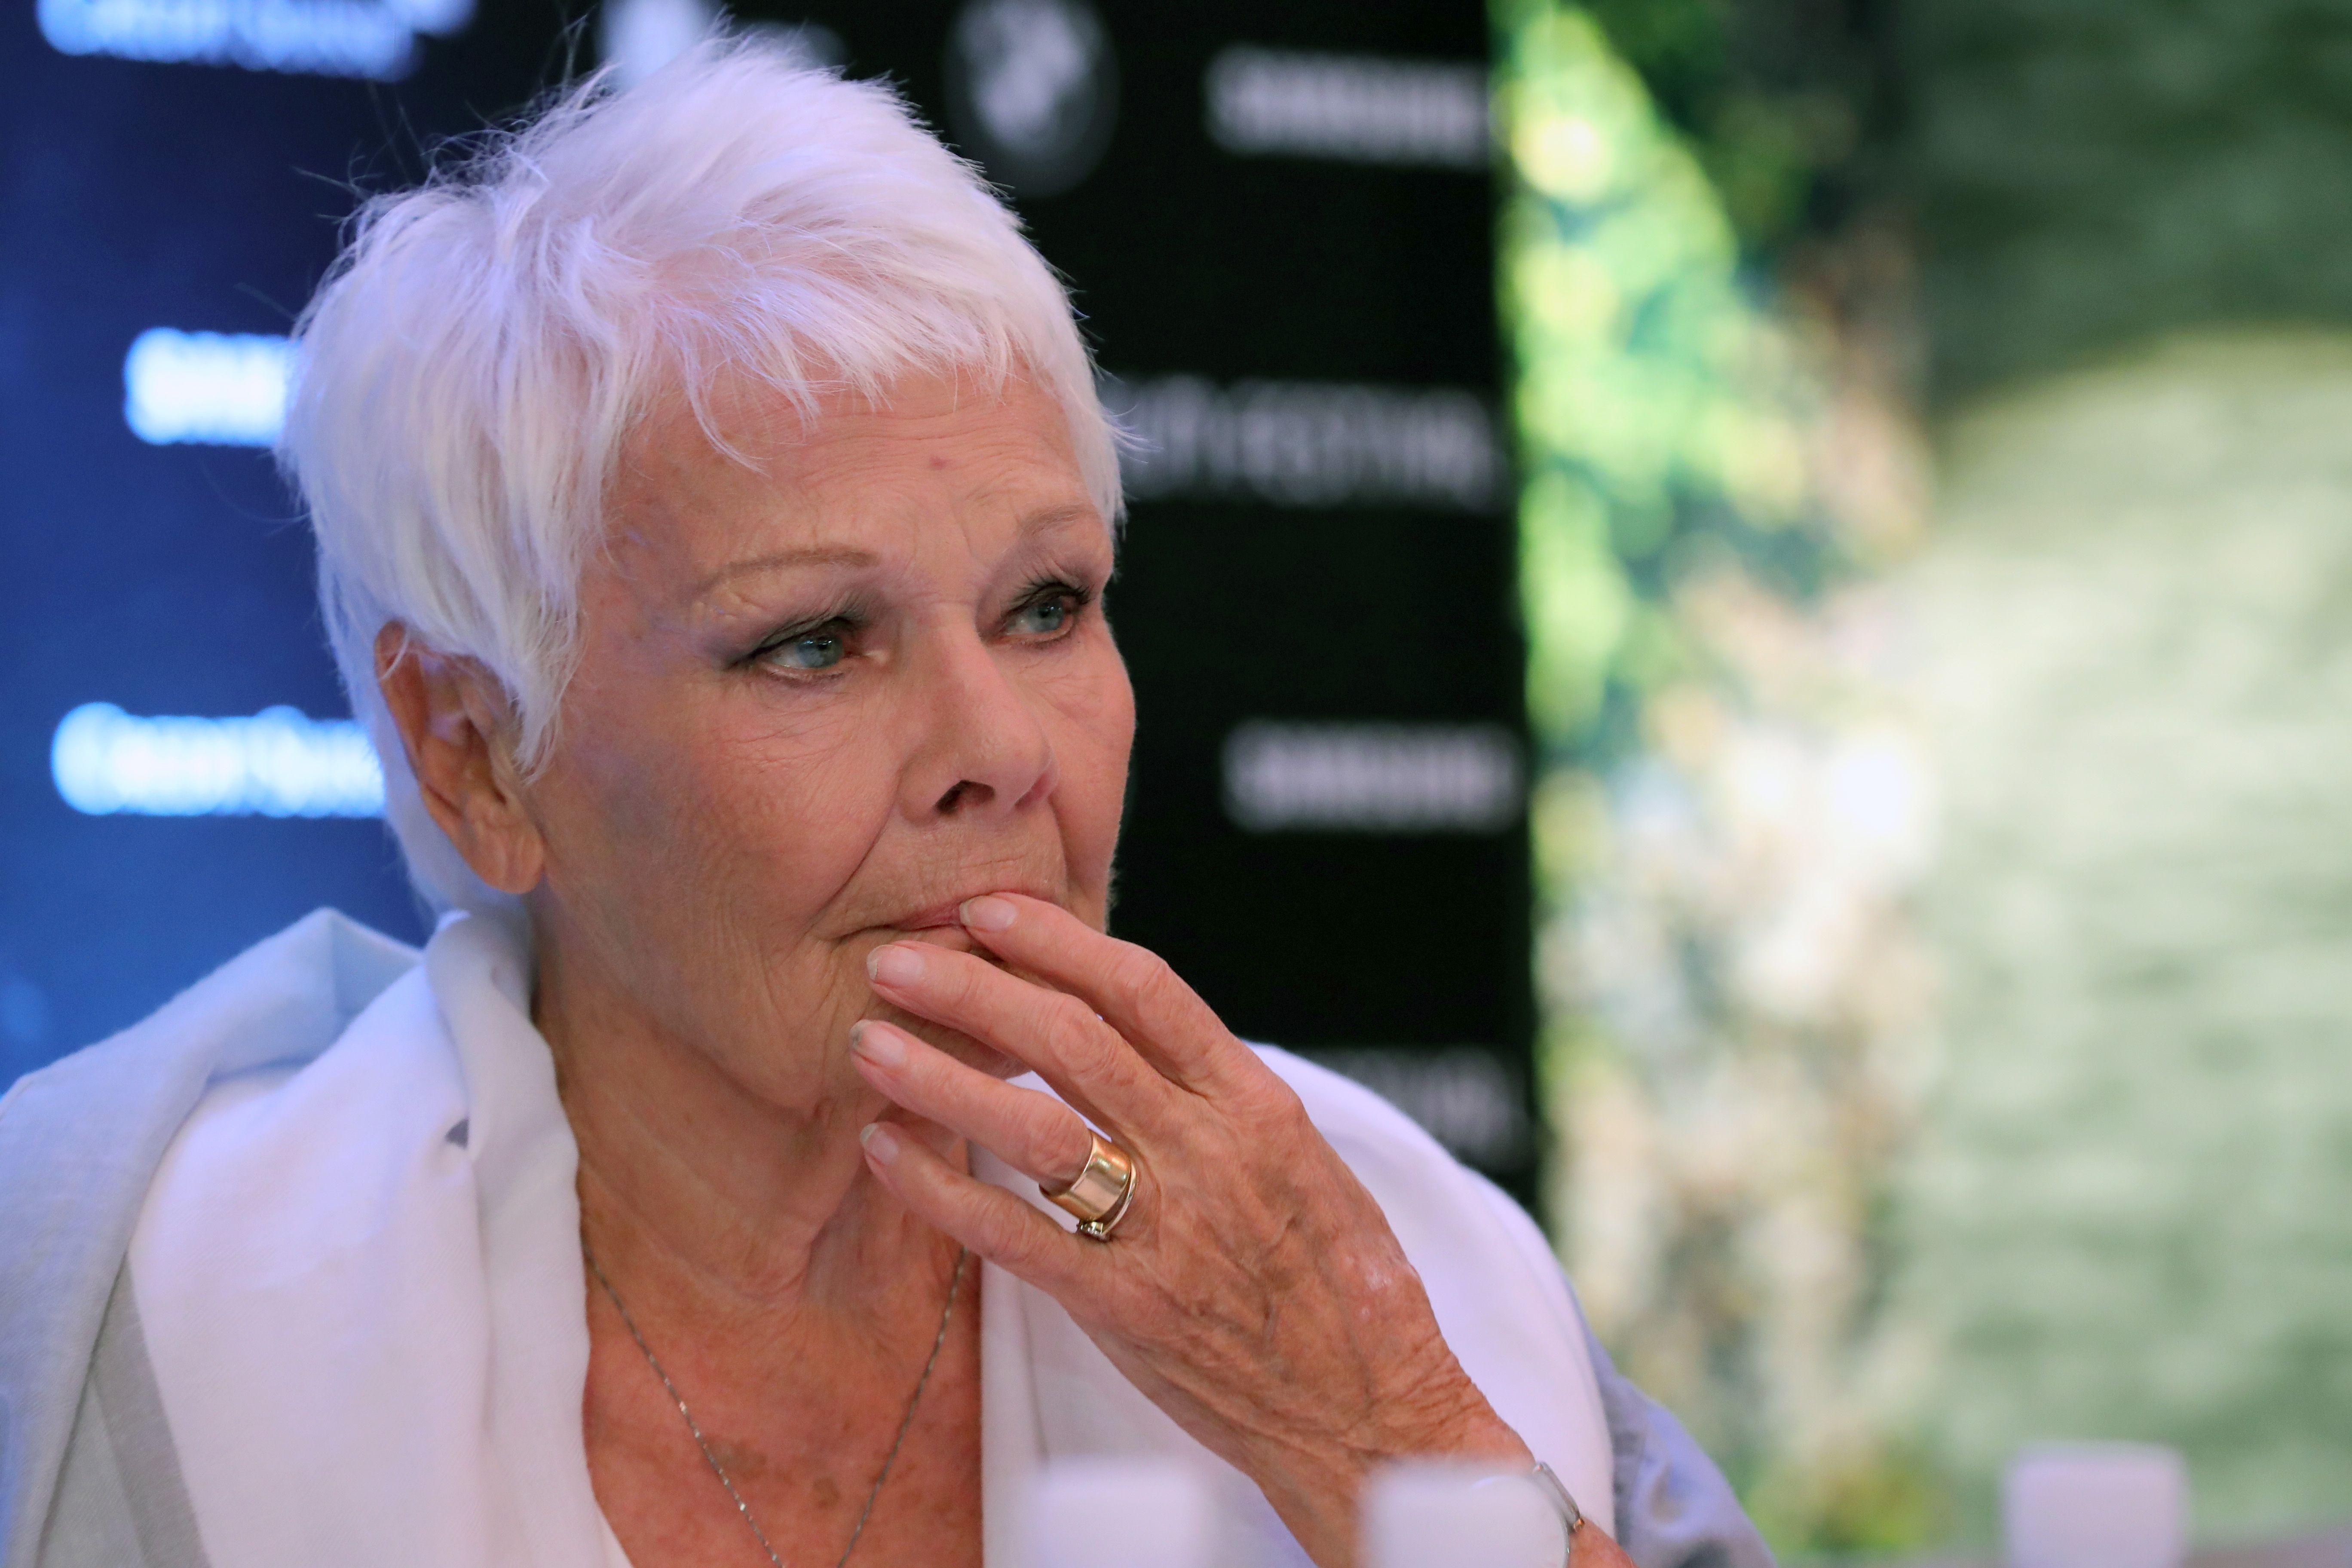 Judi Dench on Red Joan and Cary Fukunaga's James Bond ...